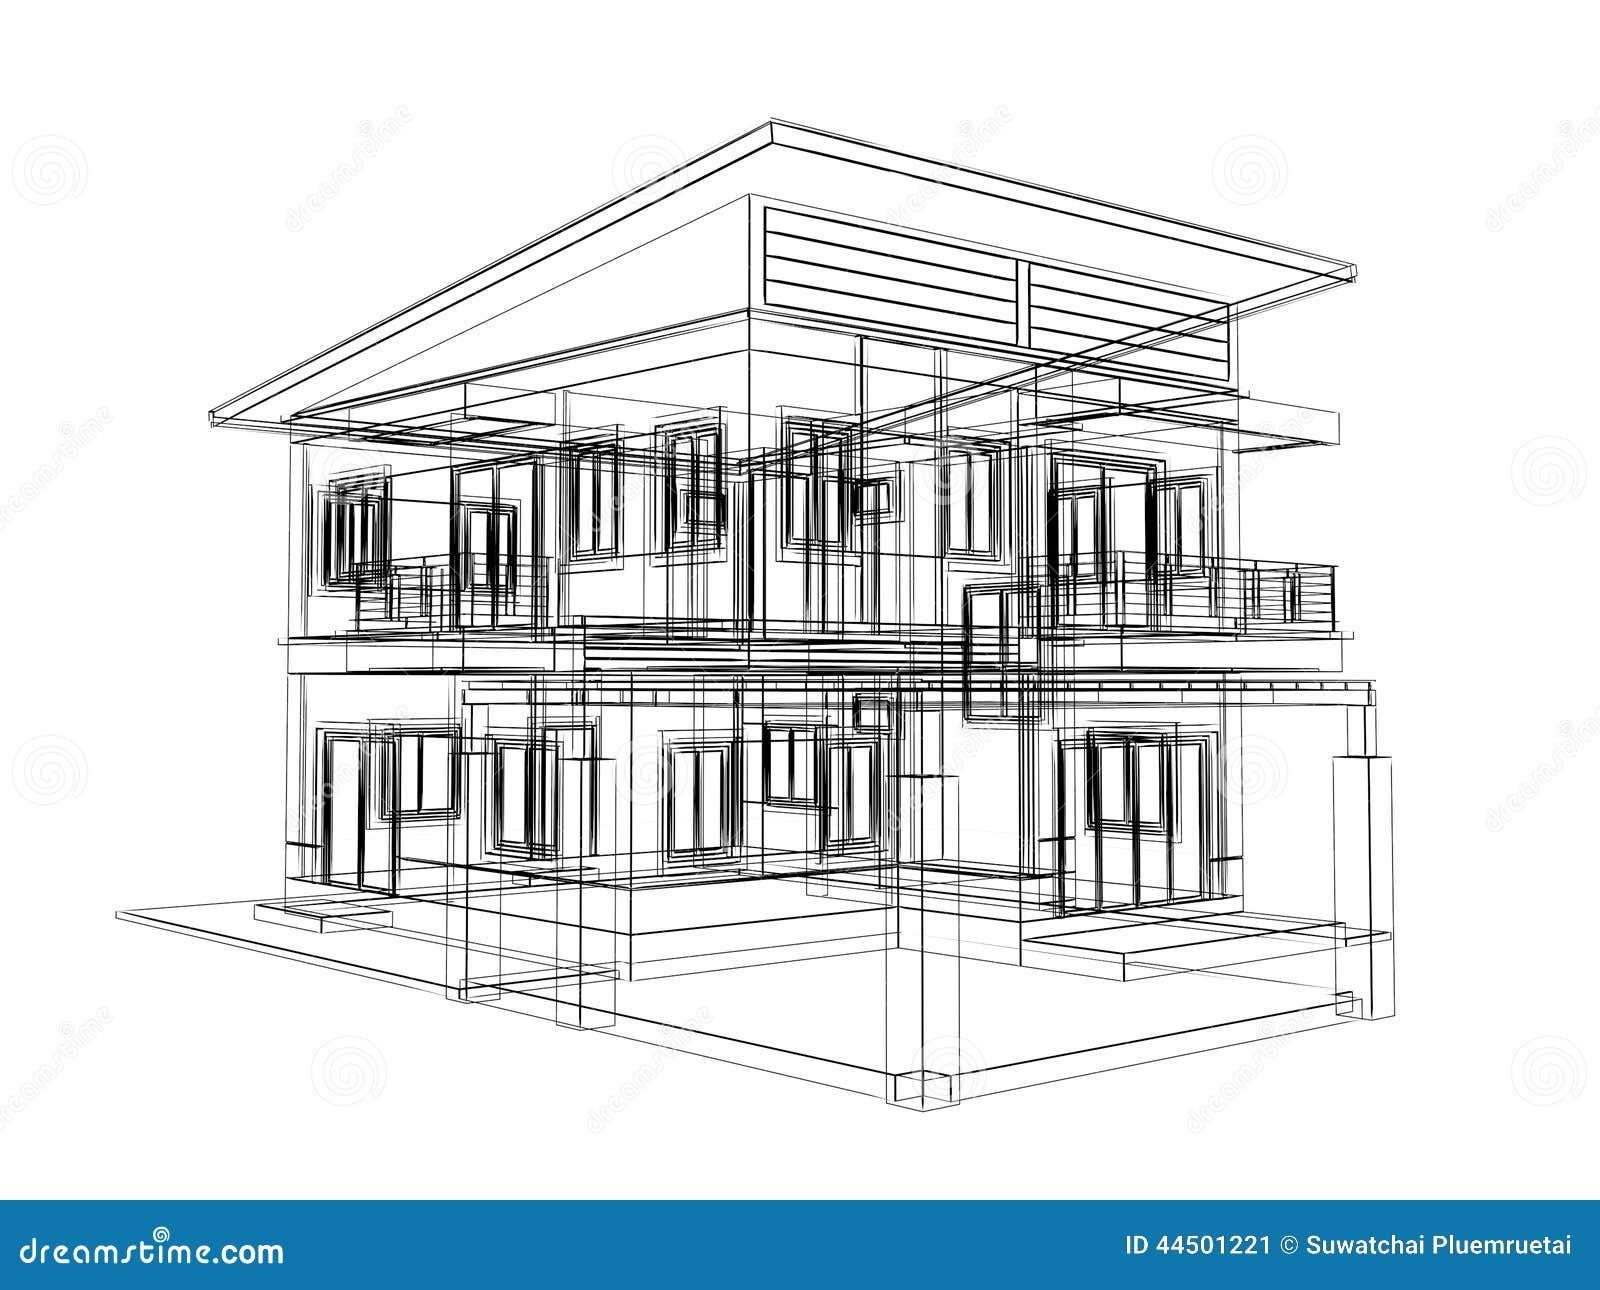 sketch design of house stock illustration